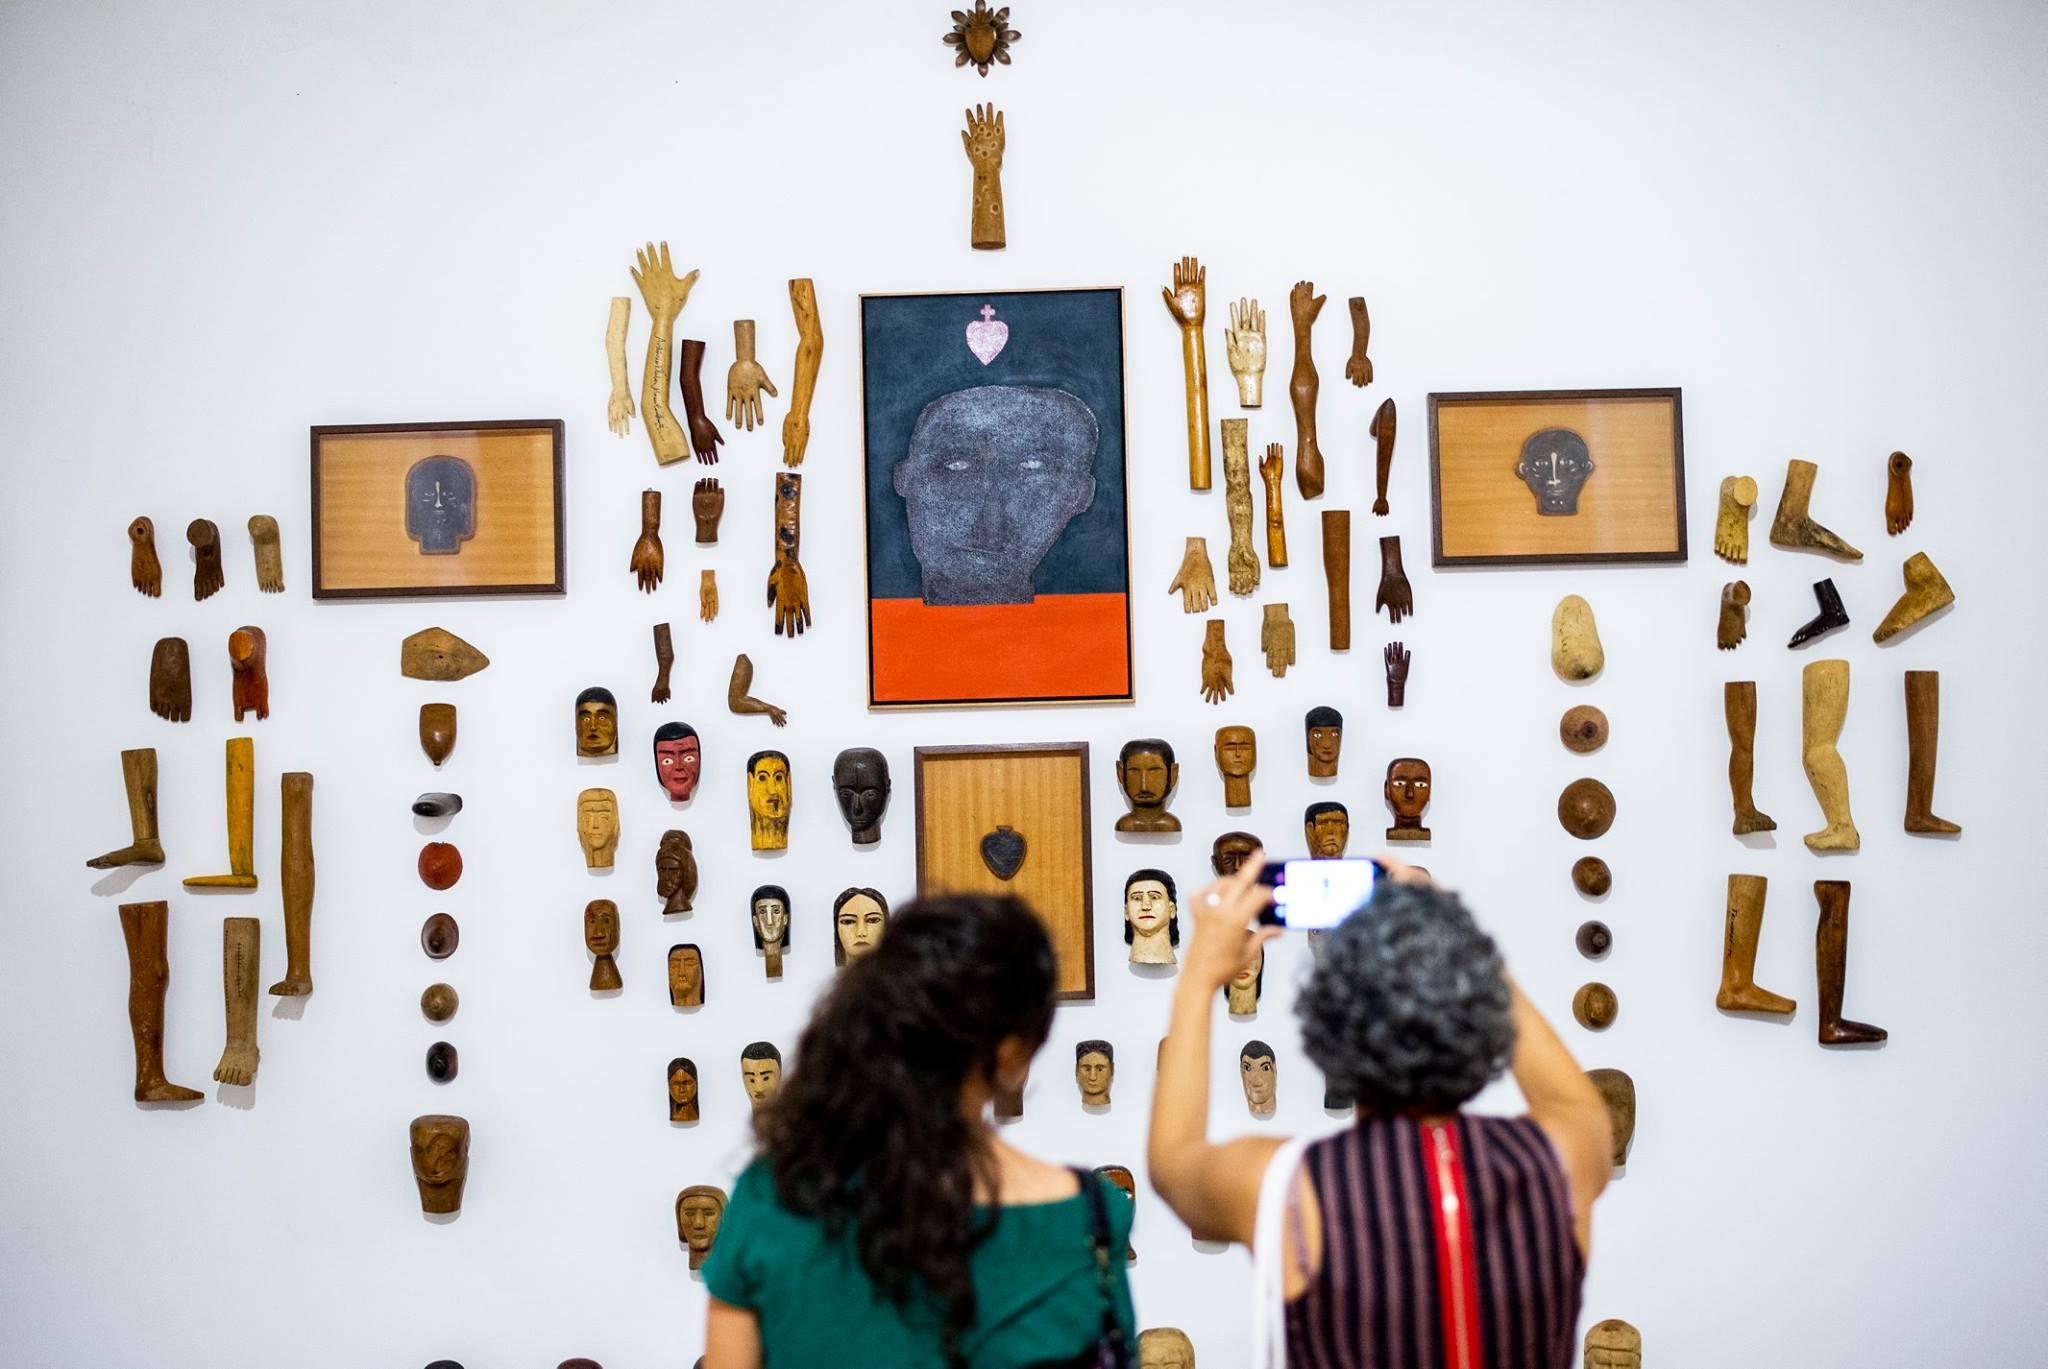 Exposição Zé Tarcísio em cartaz, em Quixadá